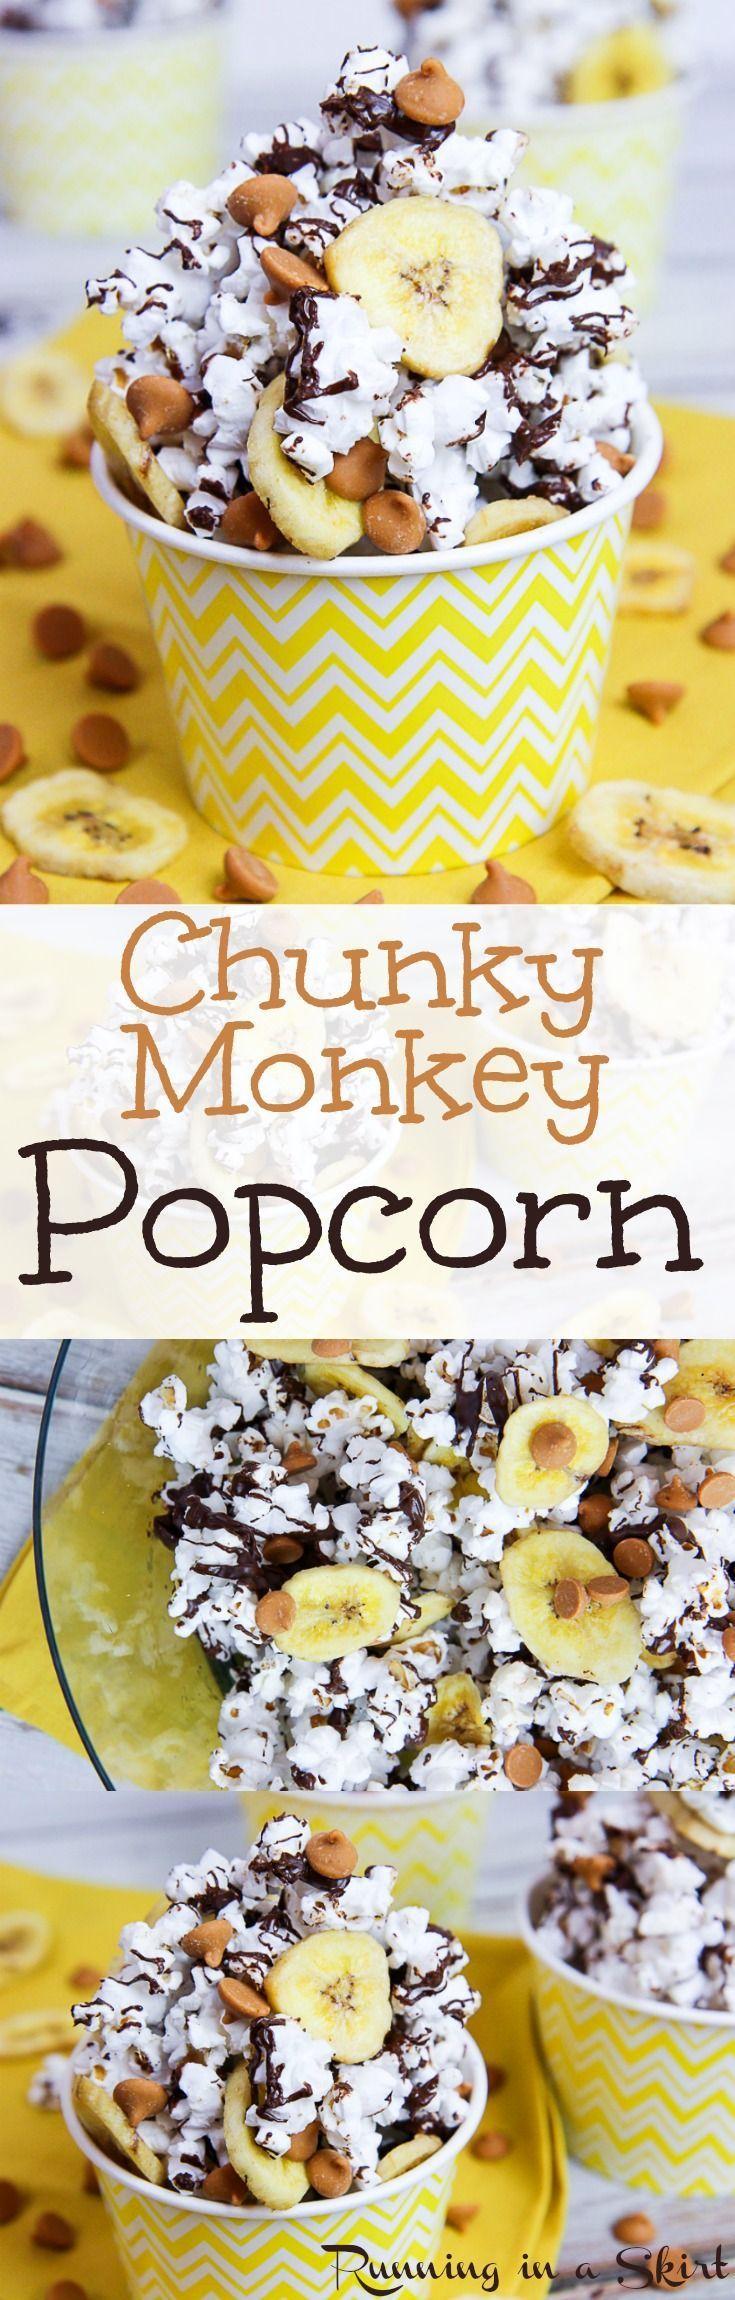 Chunky Monkey Popcorn recipe! Perfect healthy, homemade addition to popcorn…